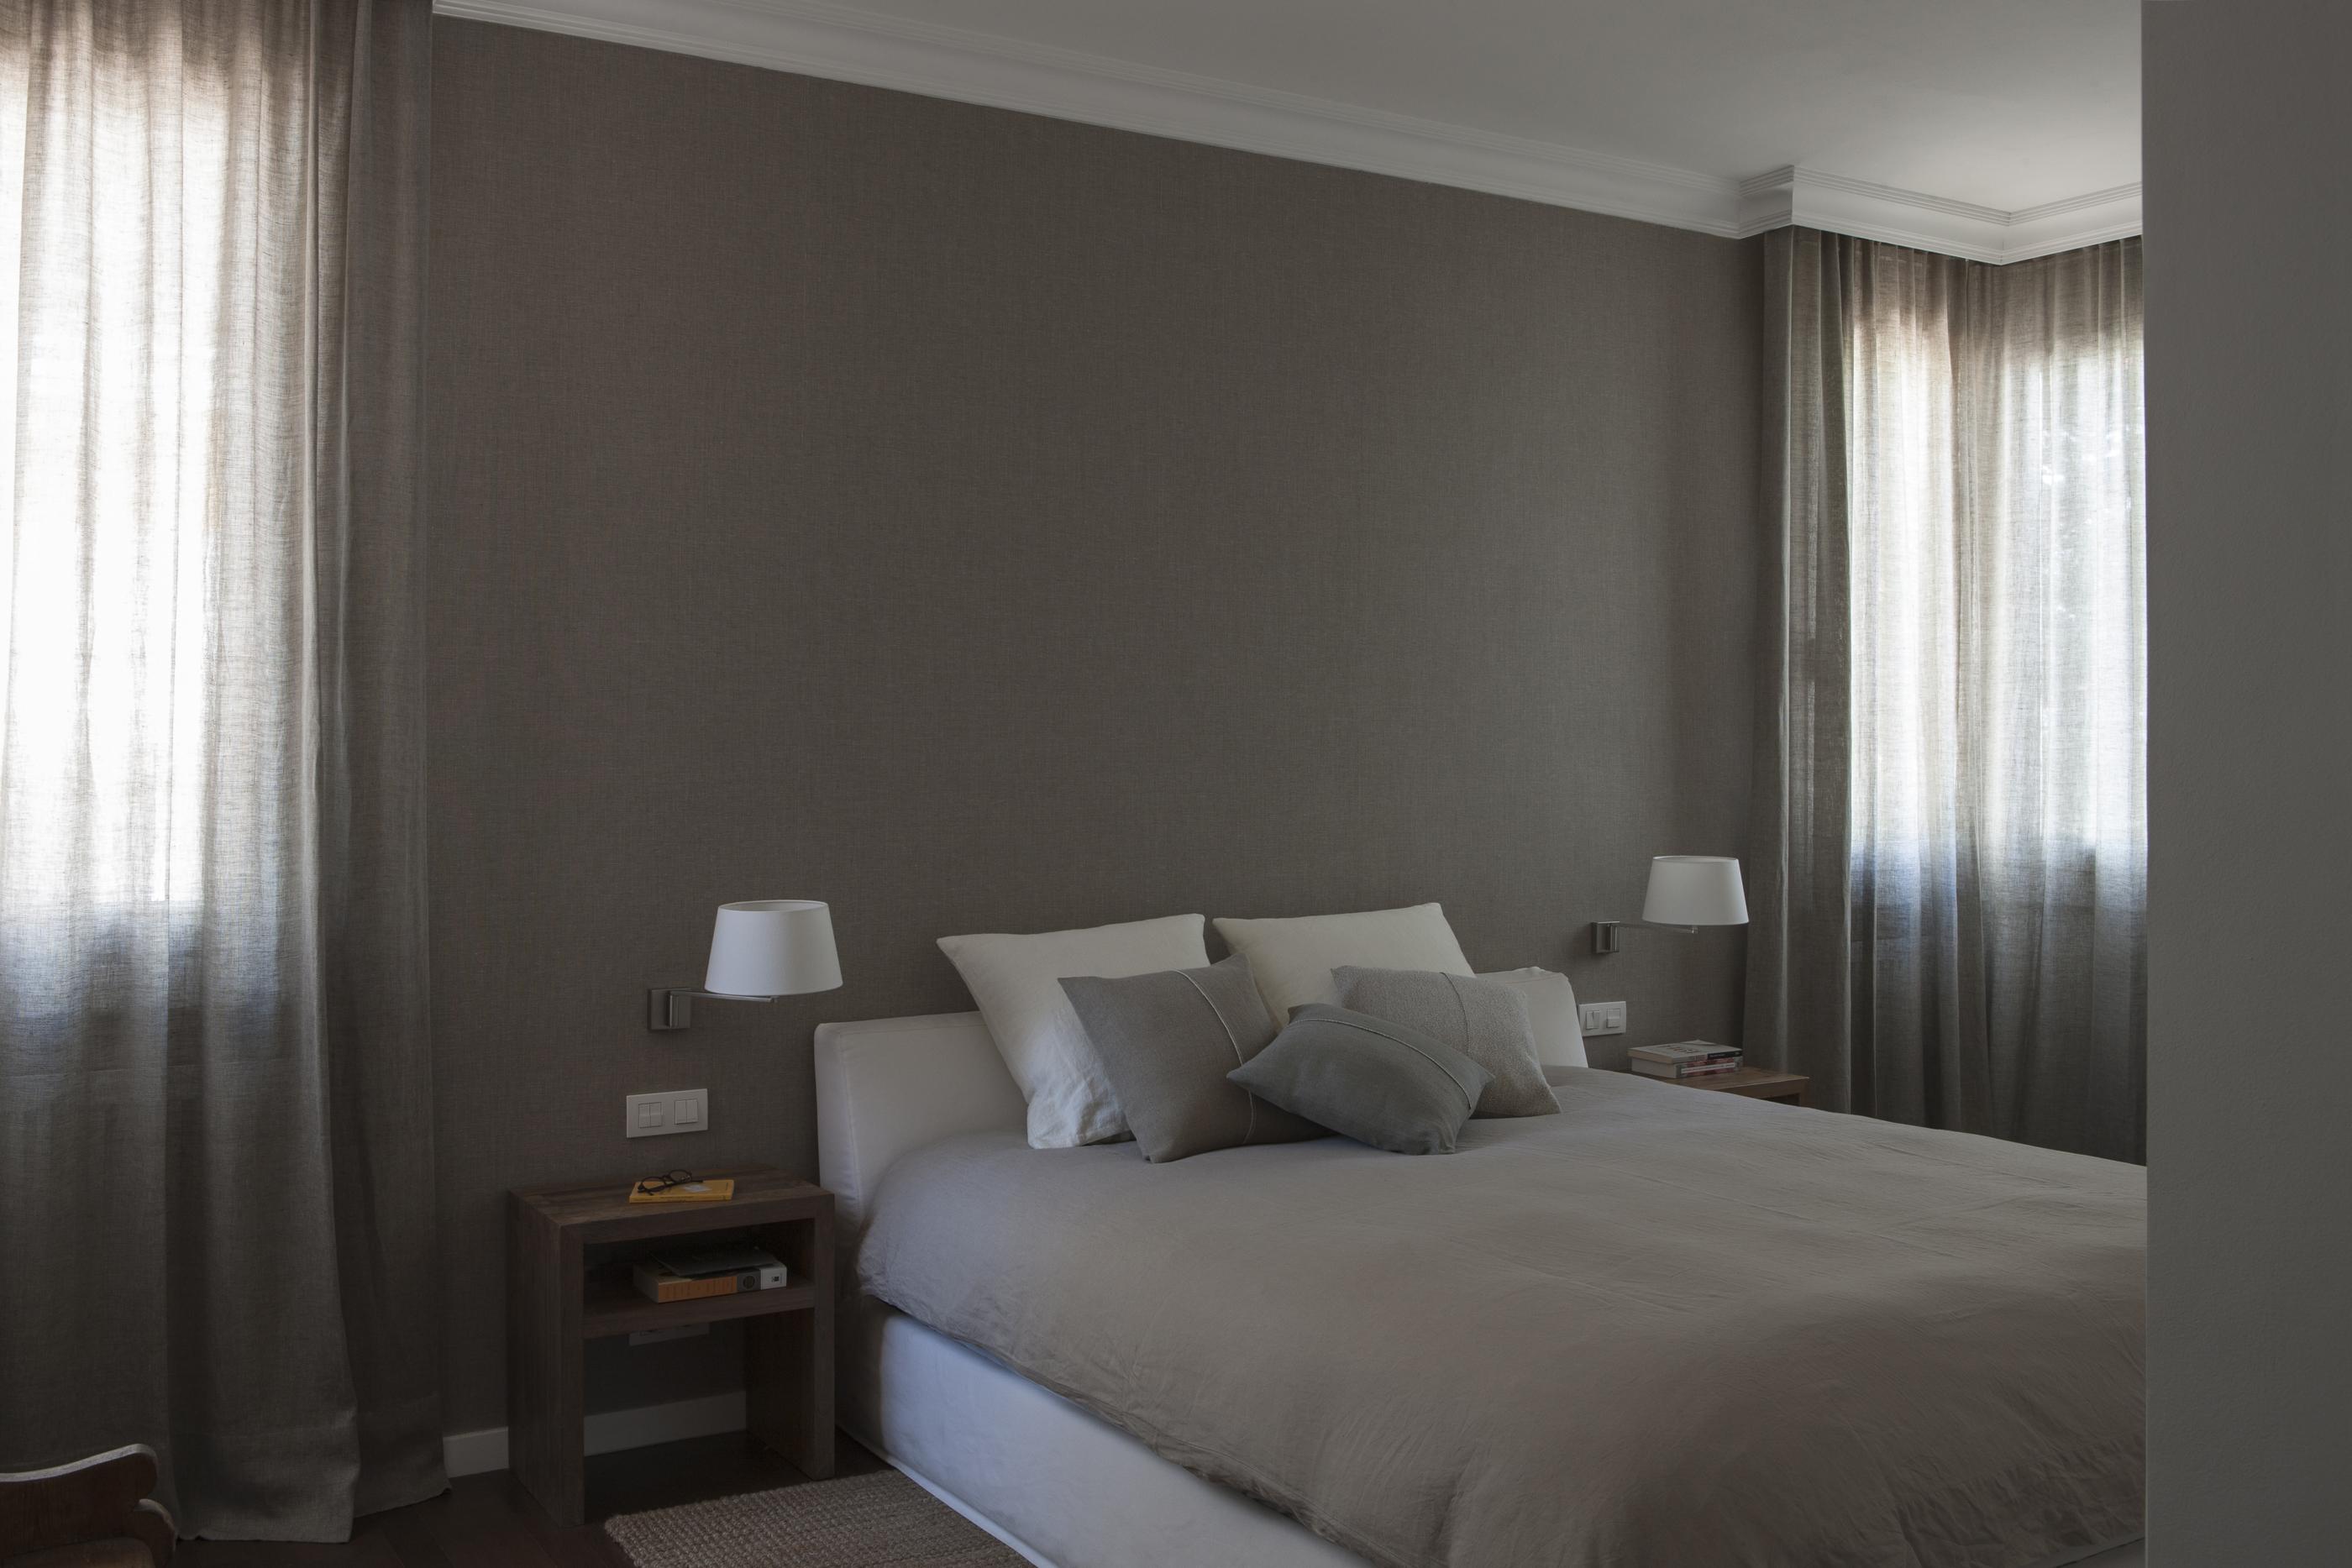 Vivienda en Via Augusta - Mayo 2015 - dormitorio